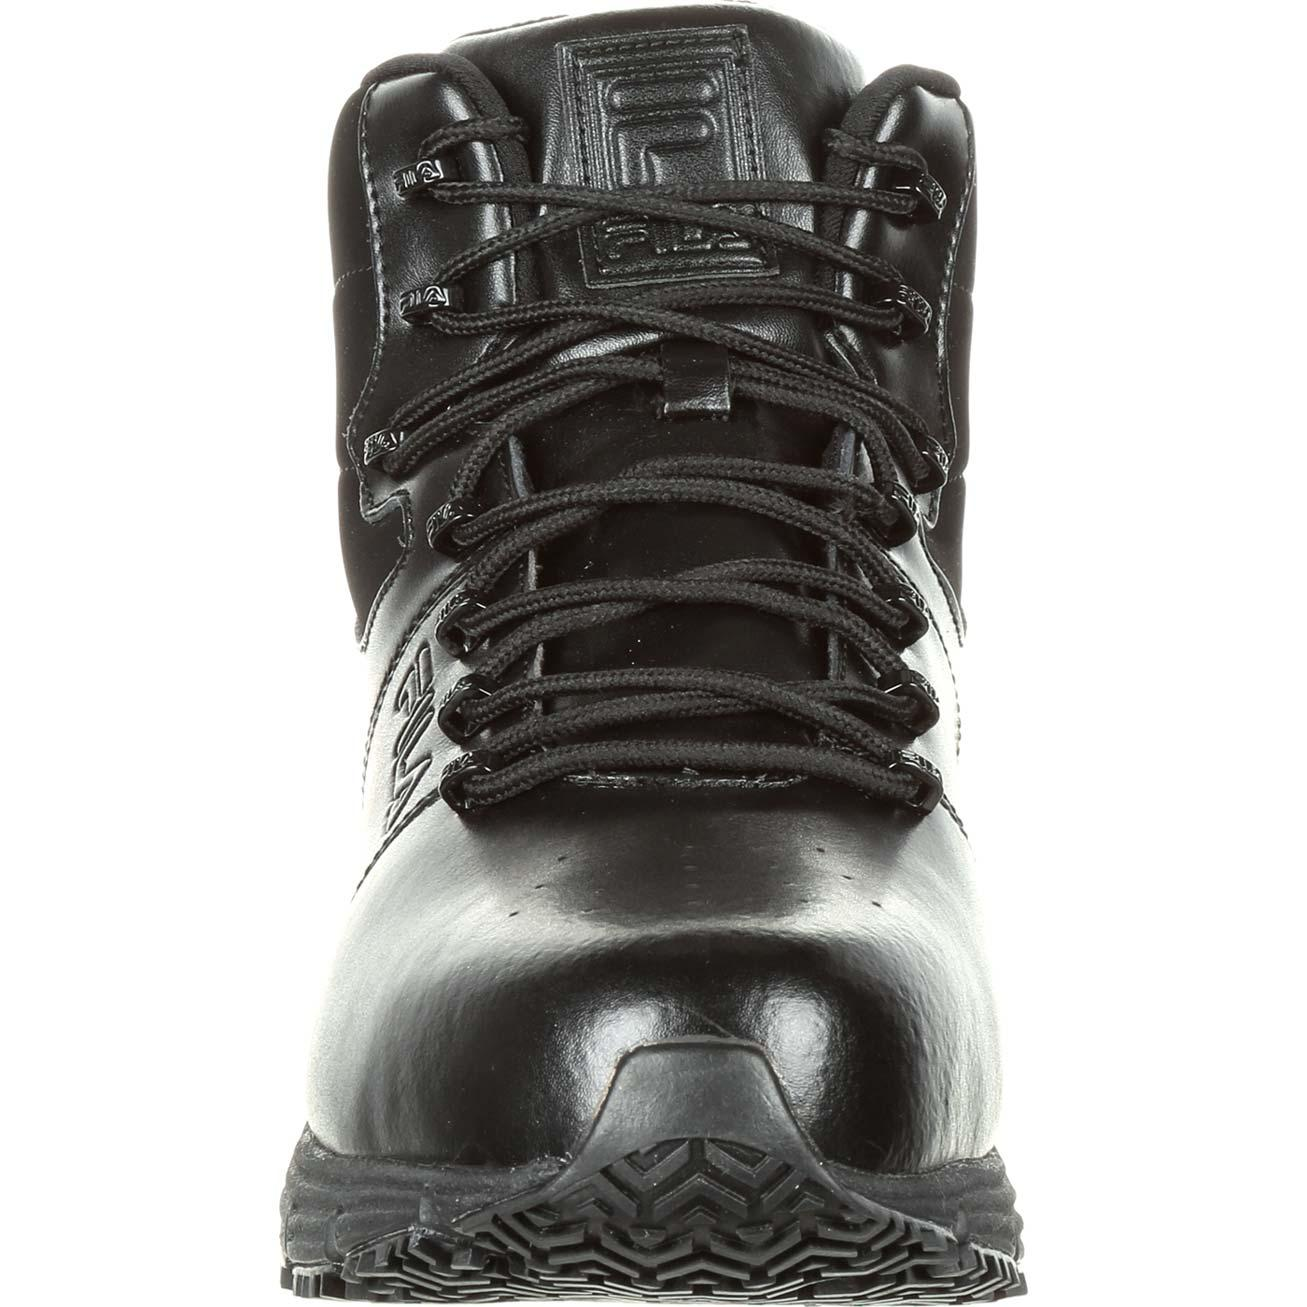 8bbd8c3b Fila Memory Breach Slip-Resistant Work Athletic Shoe